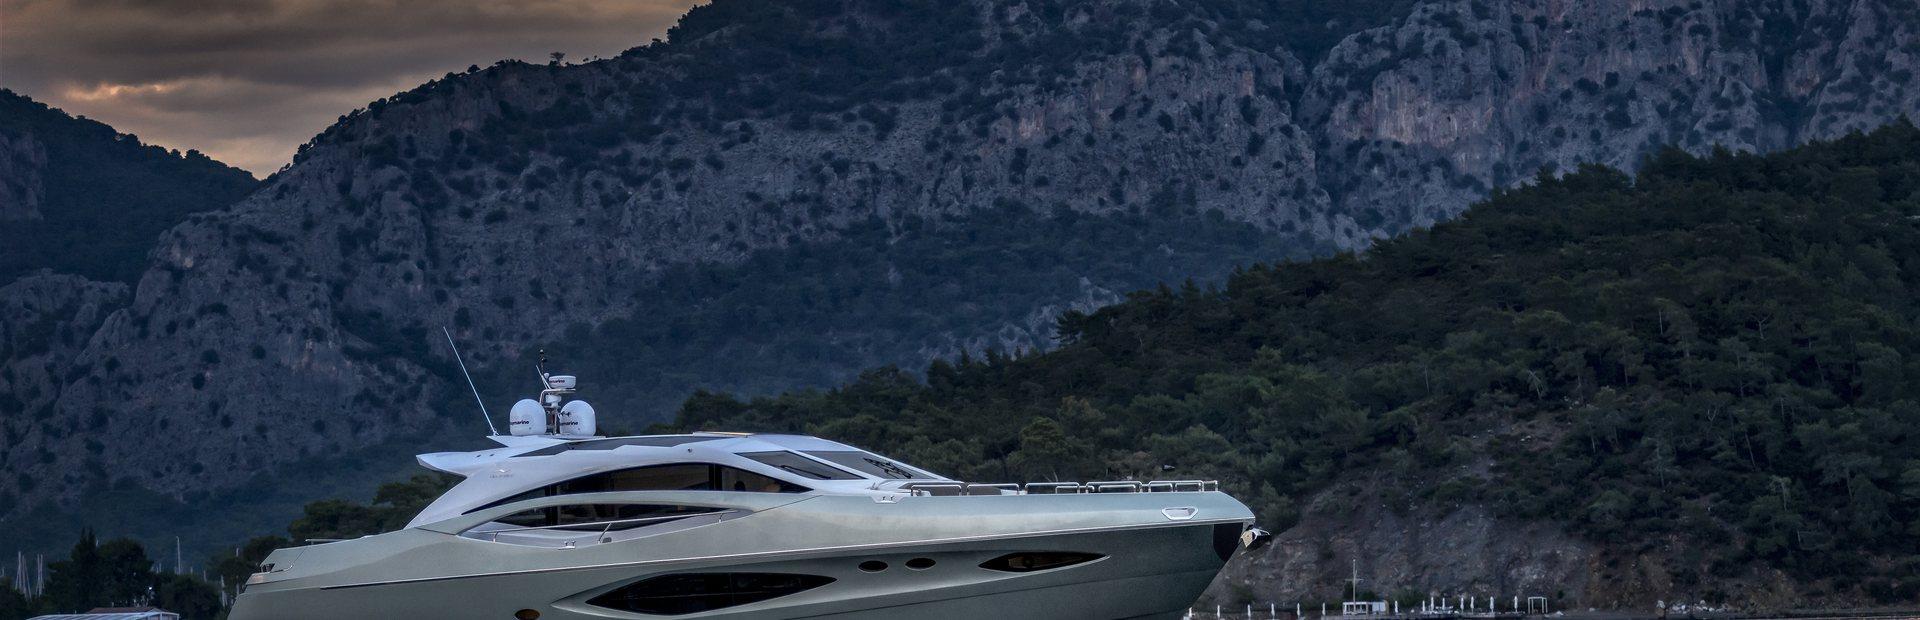 78 Hardtop Yacht Charter